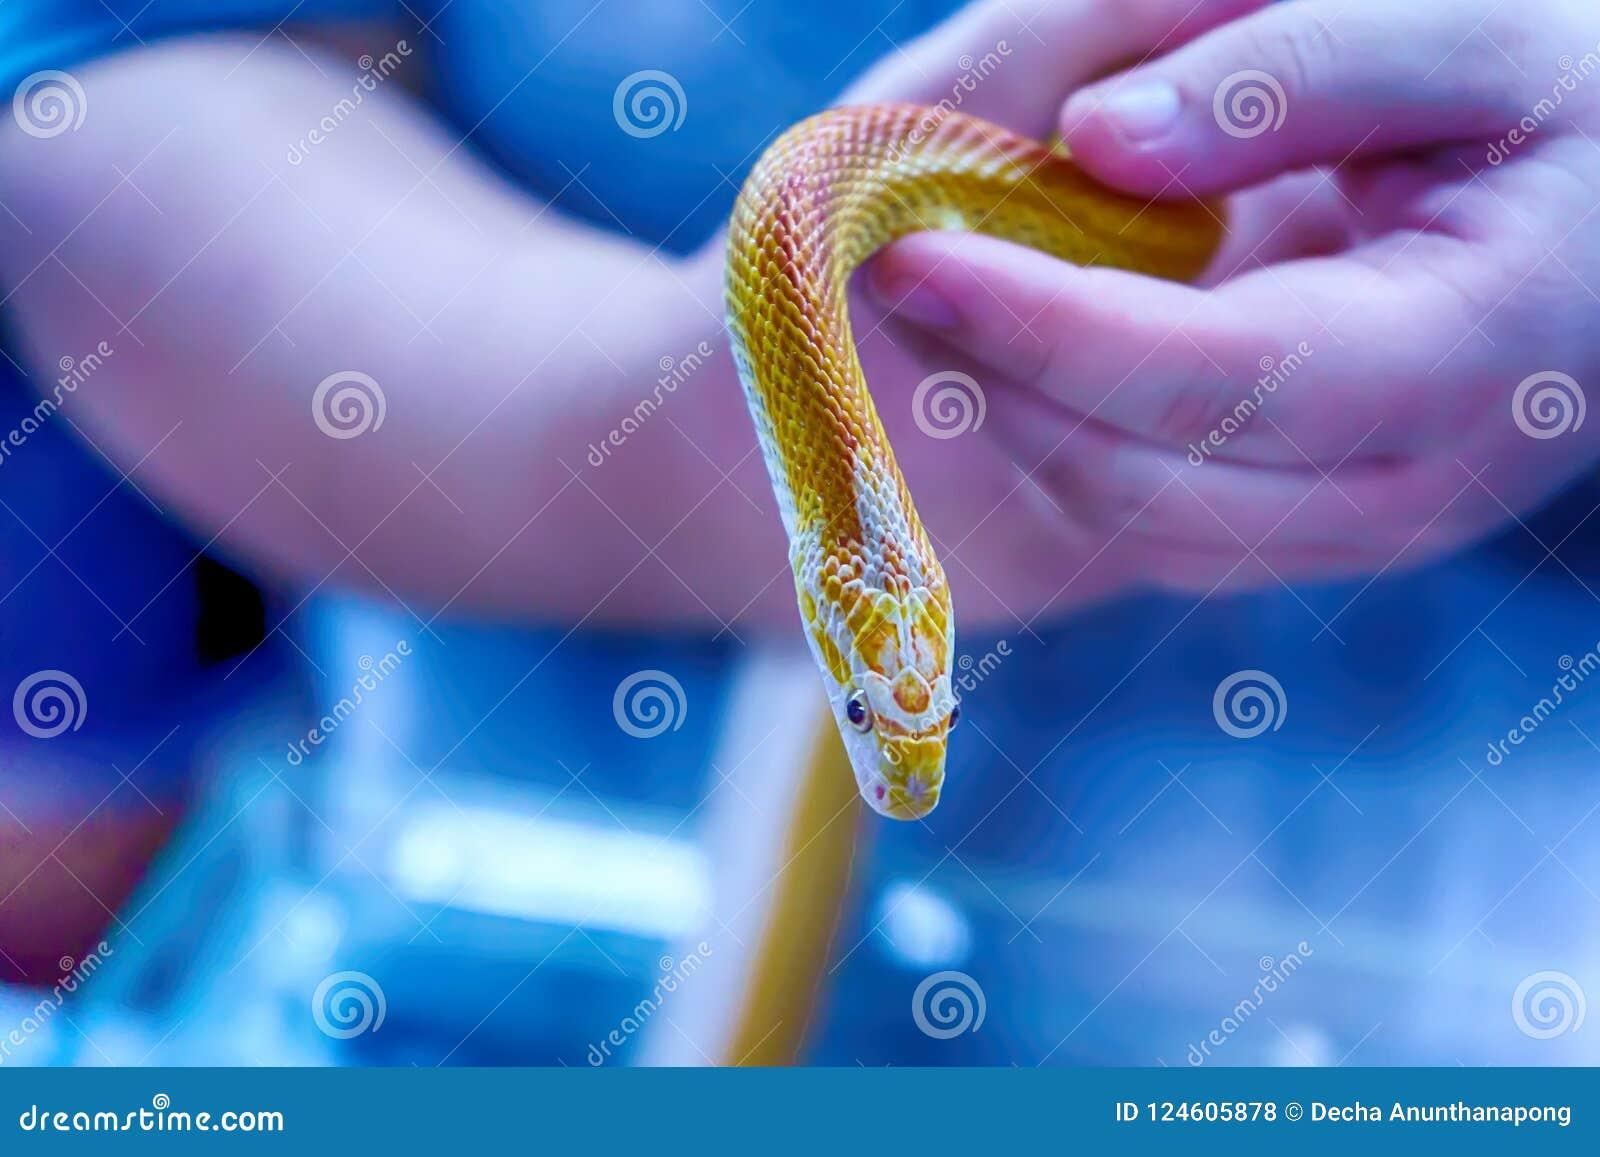 Schlange ist Haustier